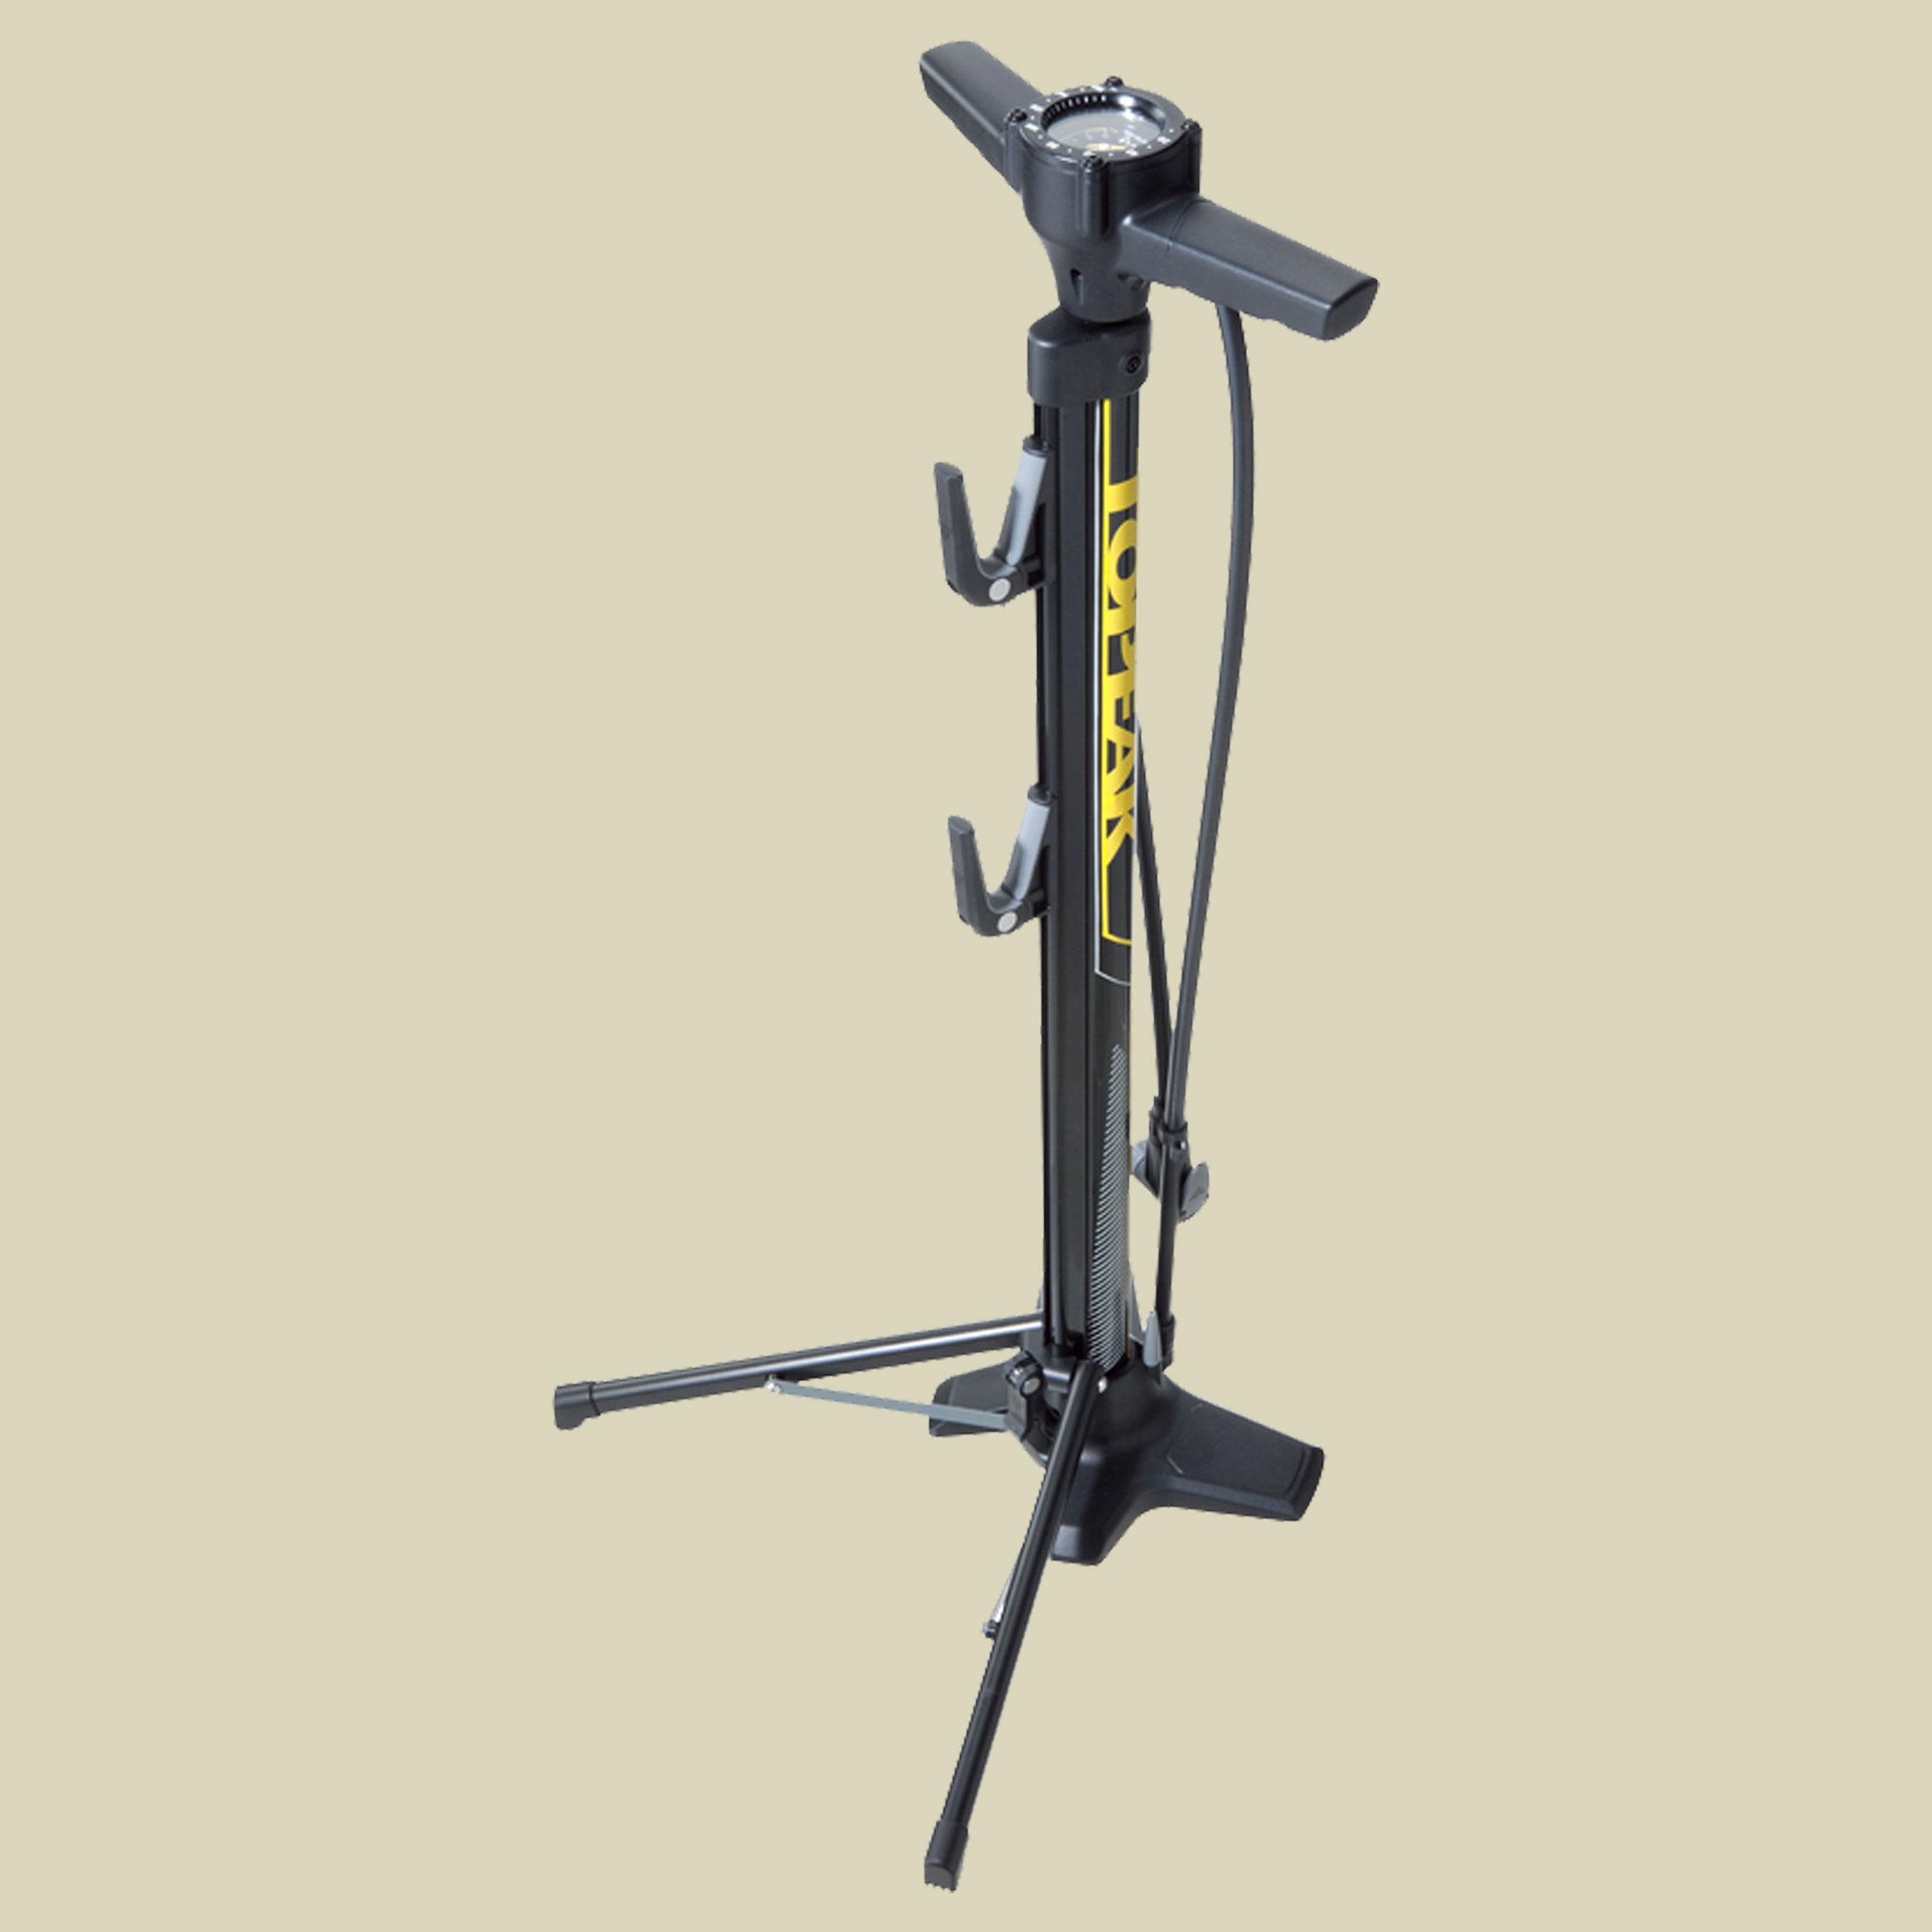 Topeak Transformer X Standpumpe Fahrrad